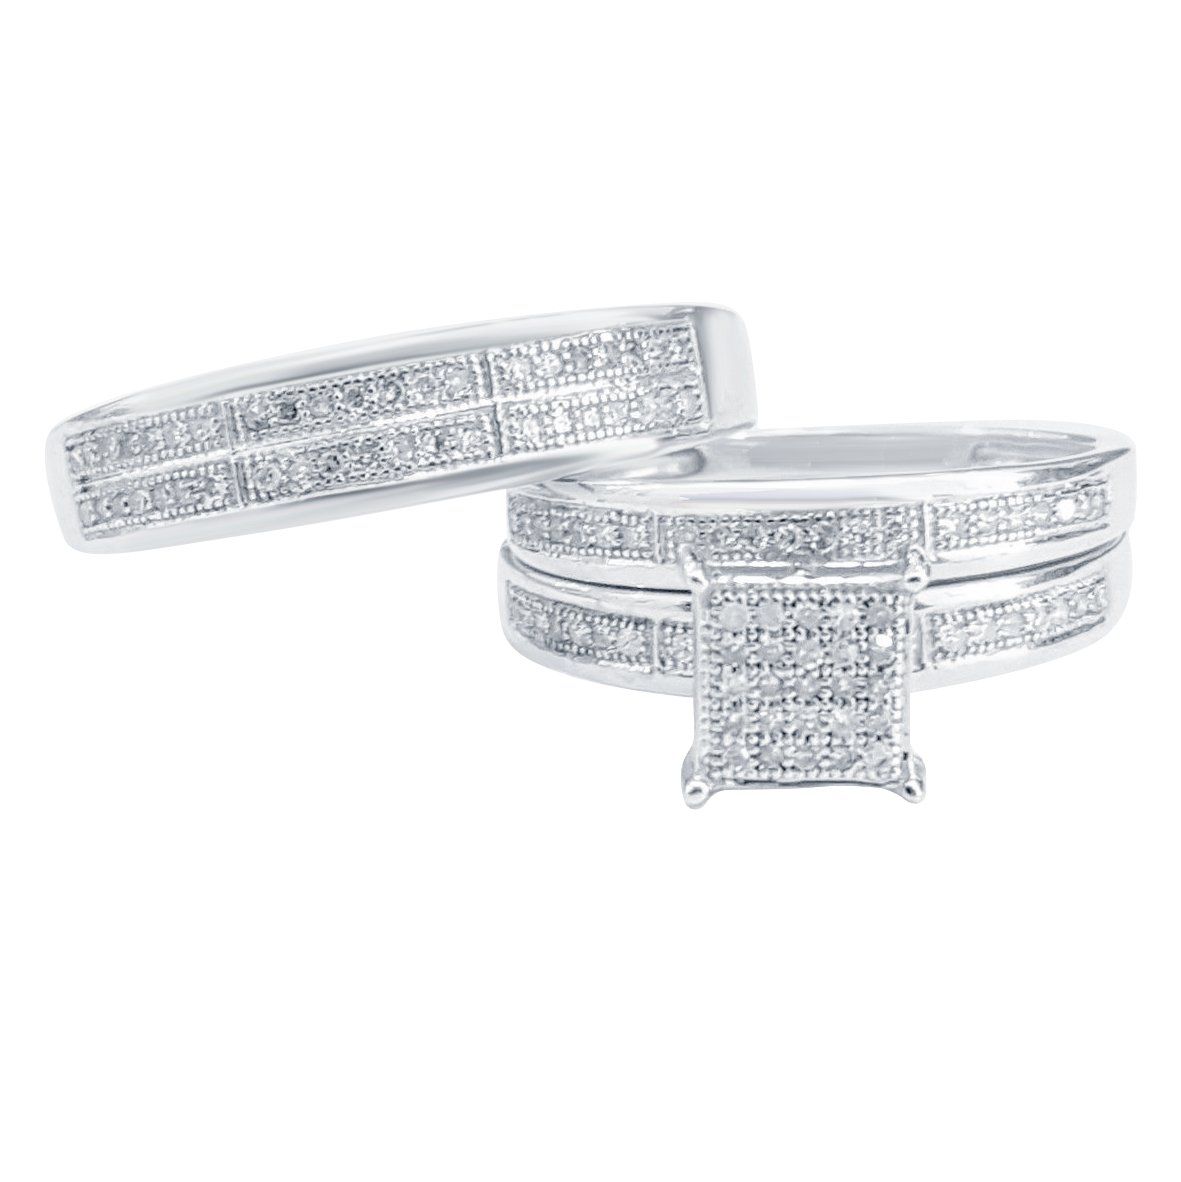 Silvercz Jewels Ladies Sim Diamond Trio Bridal Set Engagement Ring His And Her 14K White Gold Fn